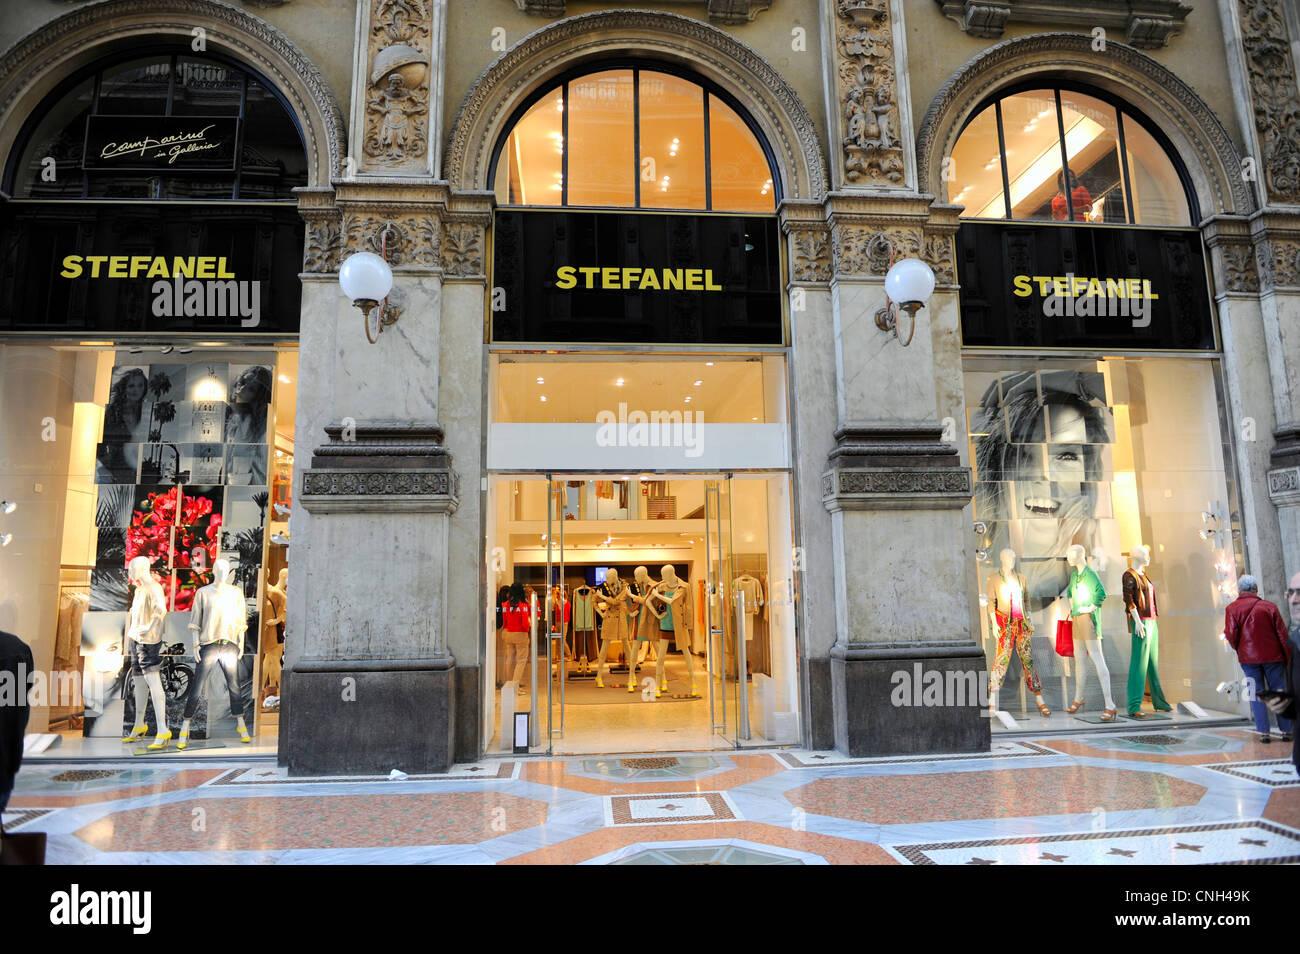 Stefanel shop. Galleria Vittorio Emanuele II. Milano, Italy - Stock Image